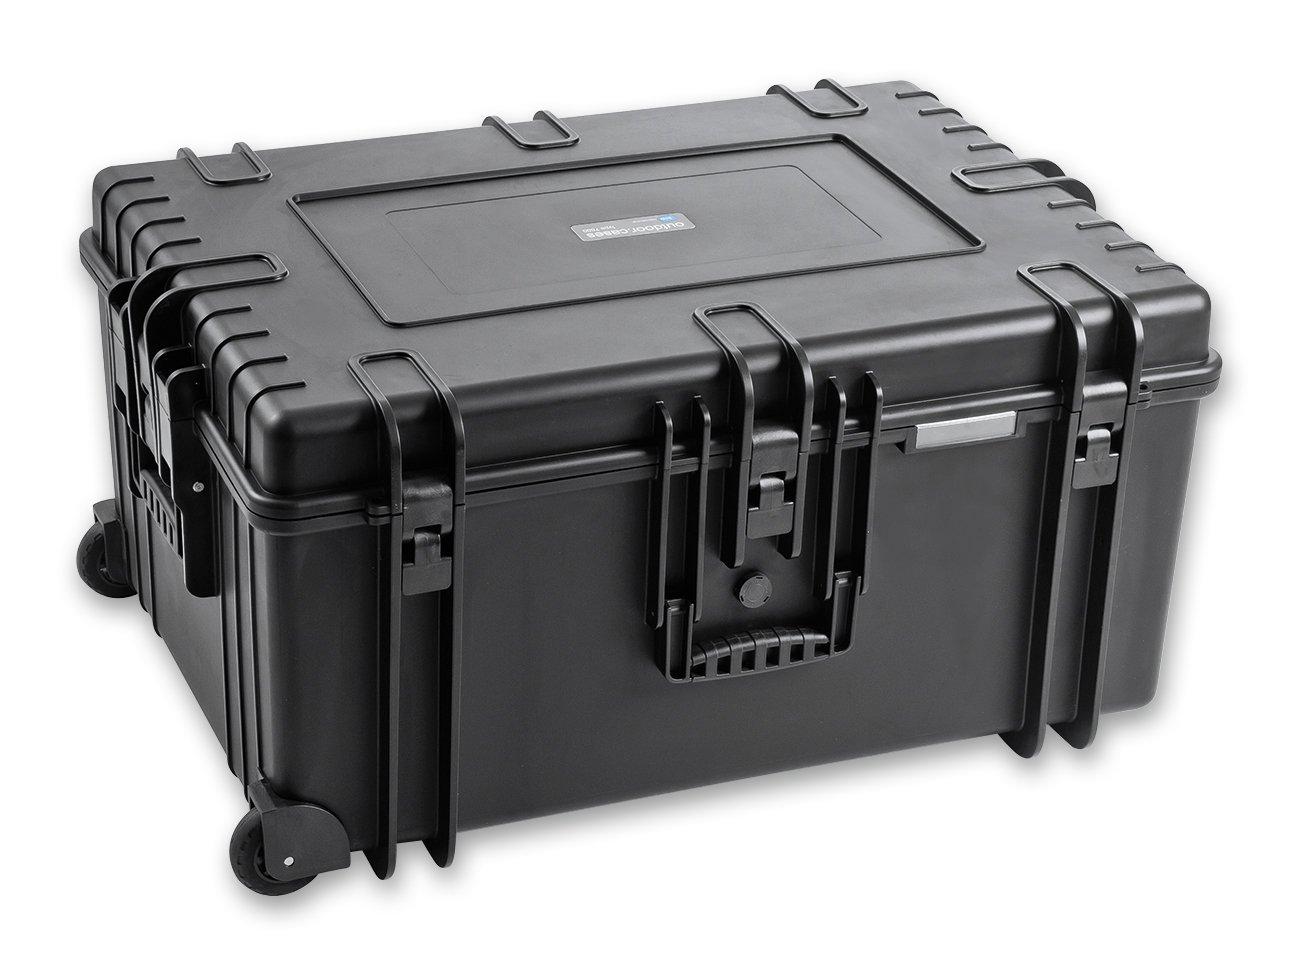 Outdoor Case Typ 7800